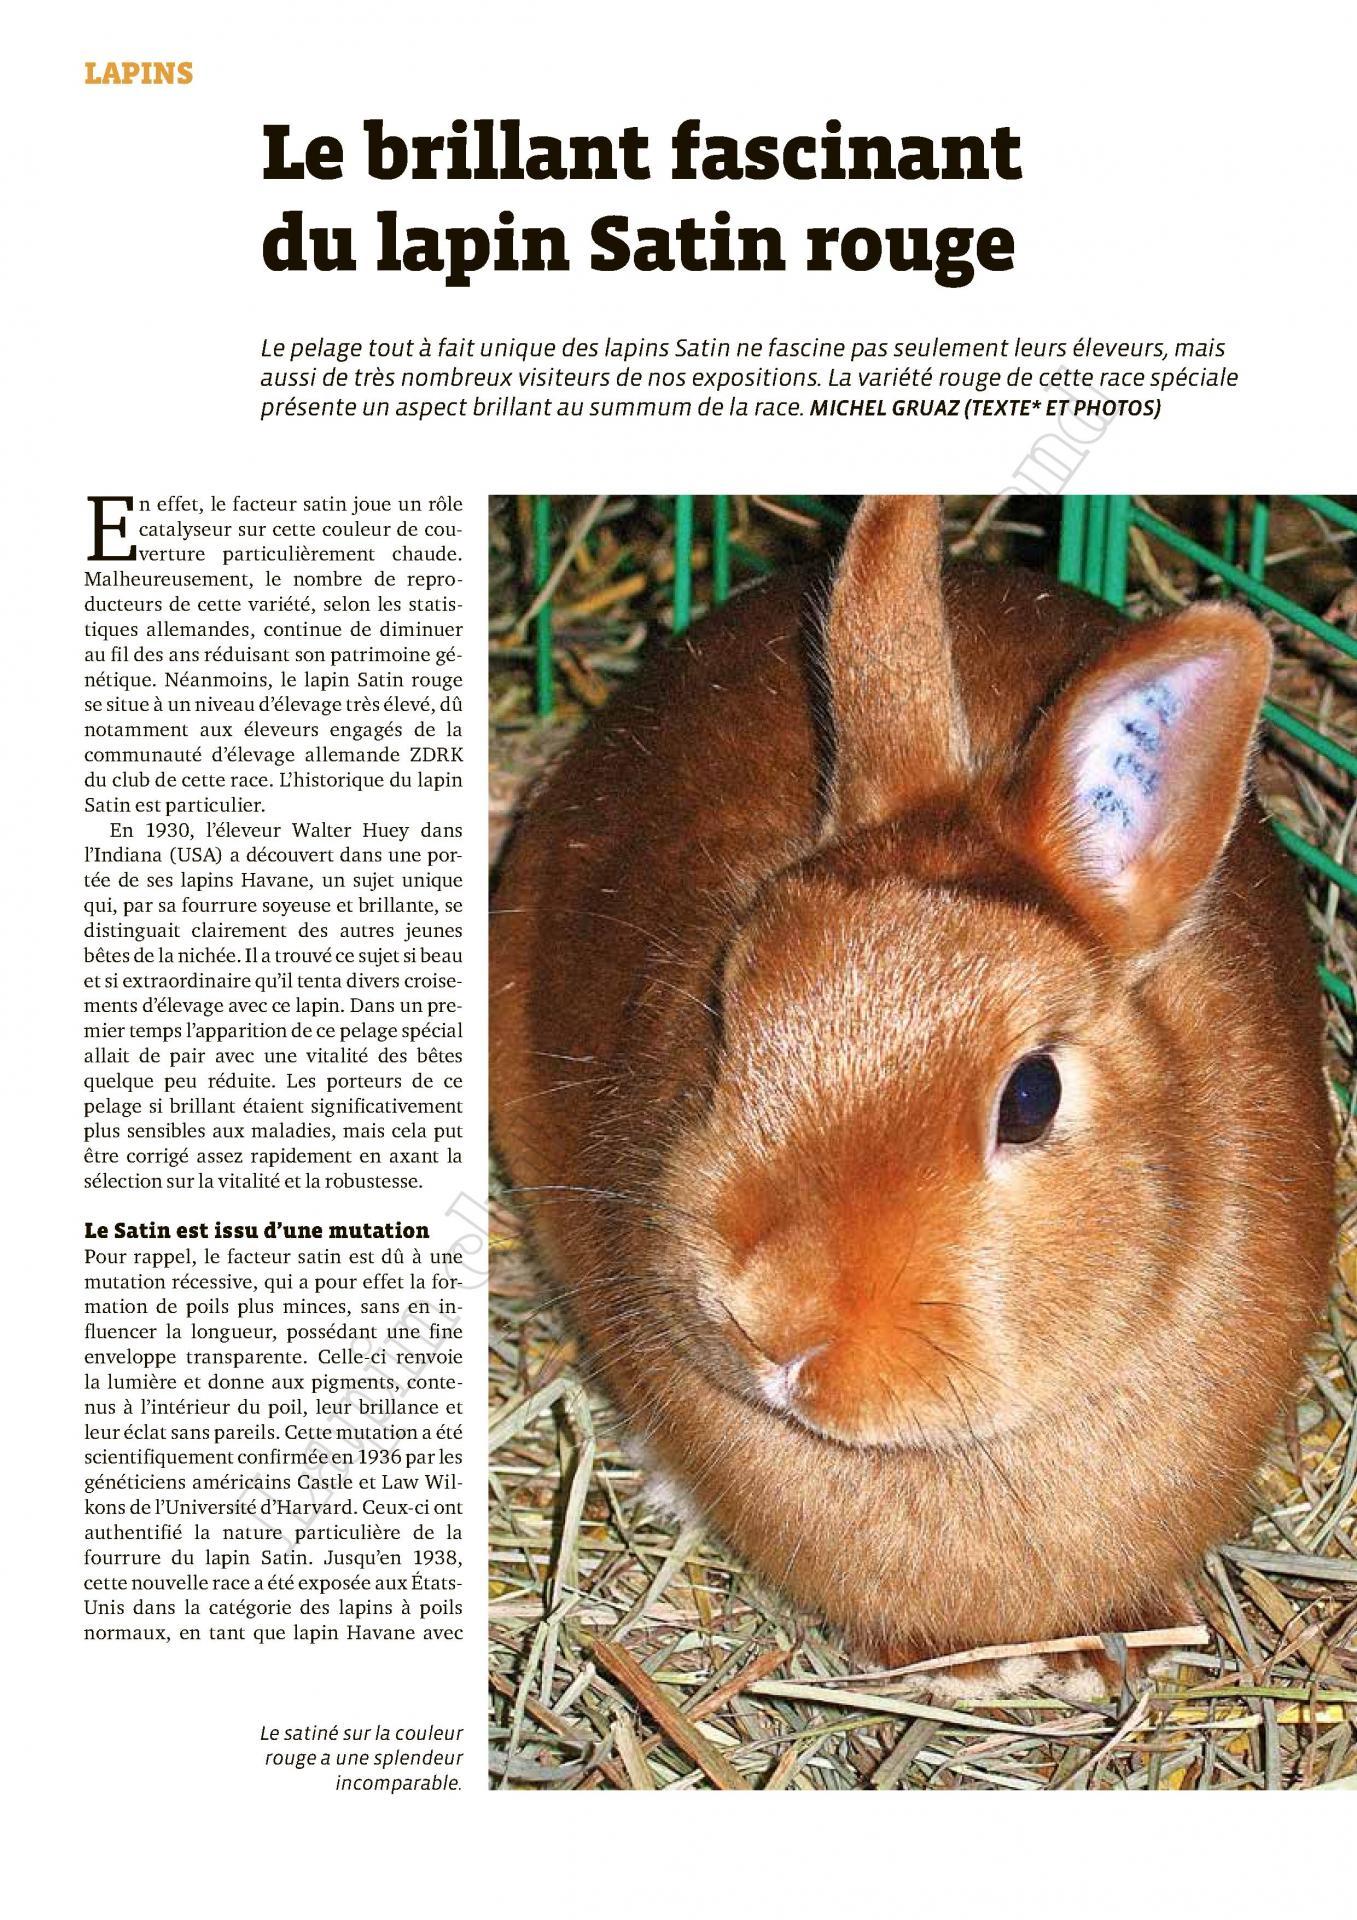 Le brillant fascinant du lapin satin rouge 1